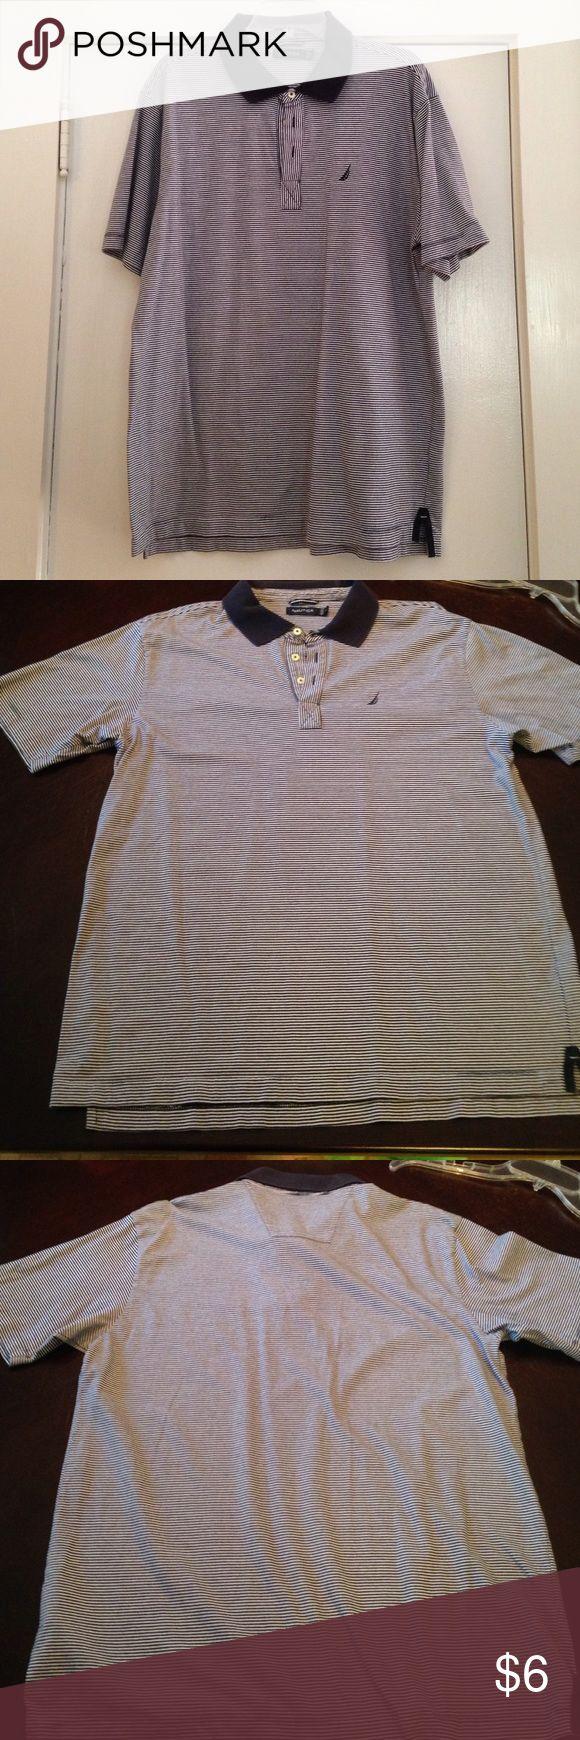 Polo shirt 100% cotton polo. Slight fading around top of collar Nautica Shirts Polos